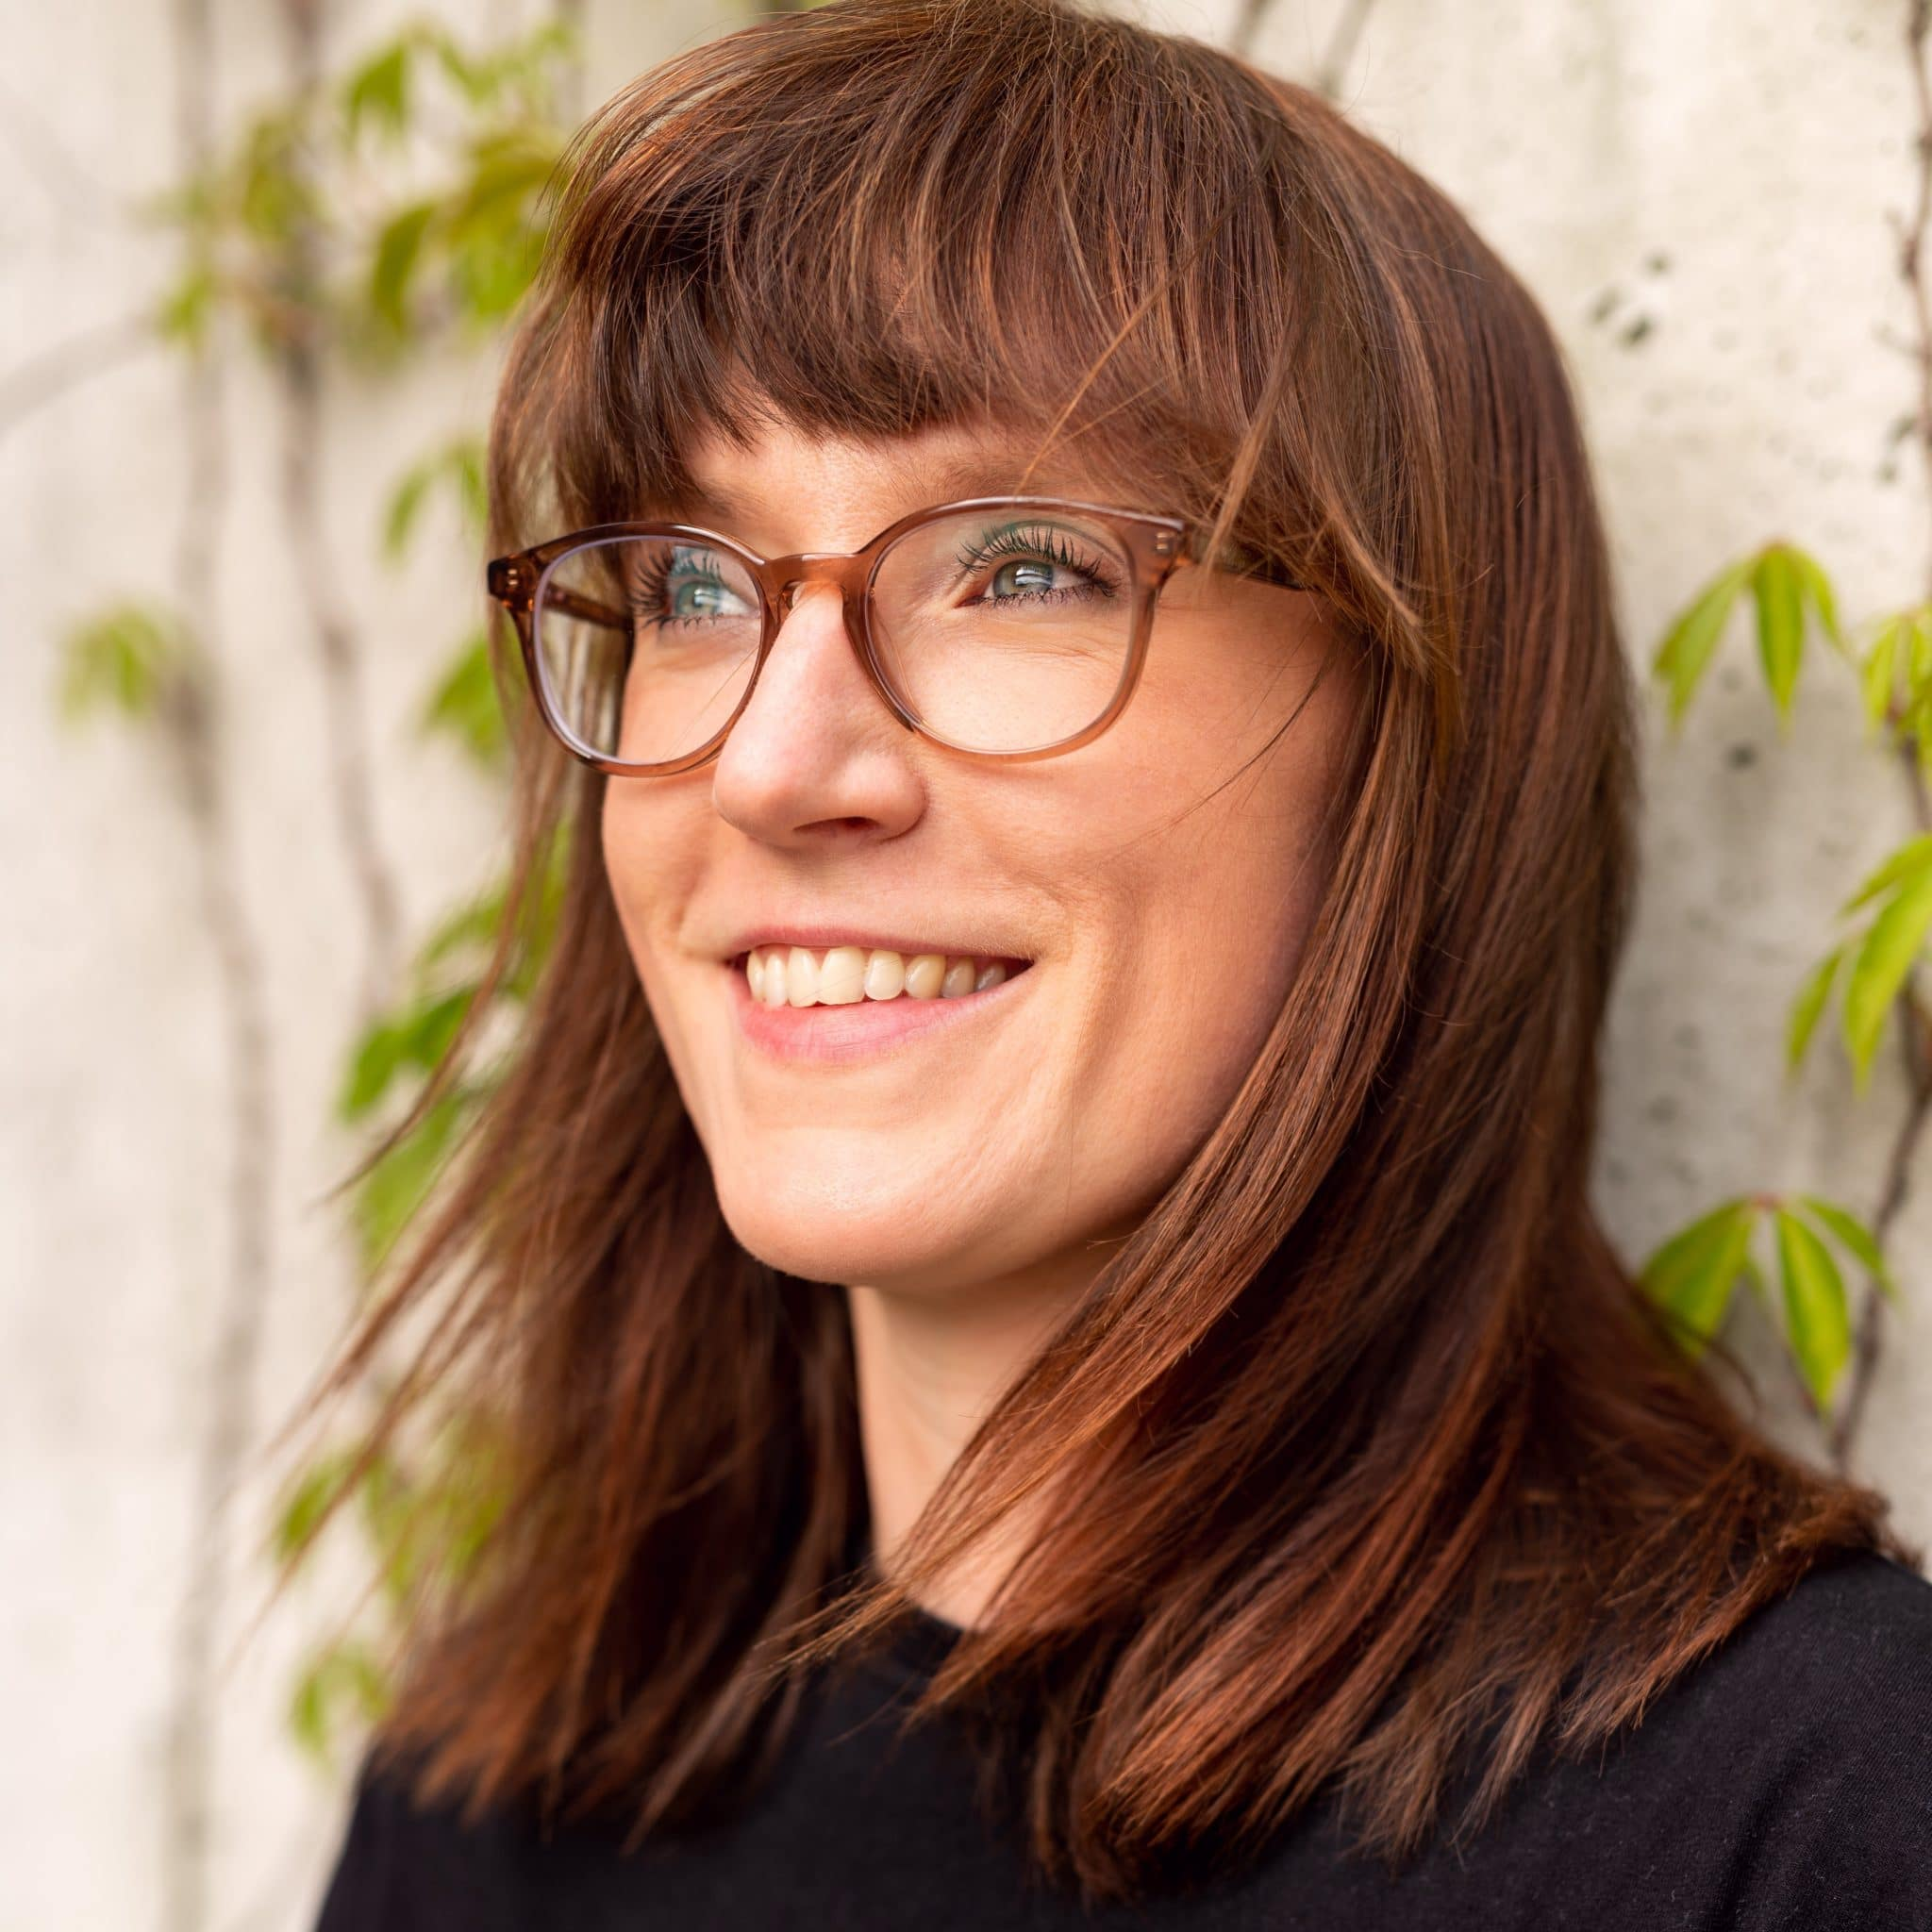 Belinda Menzel Virtuelle Assistentin